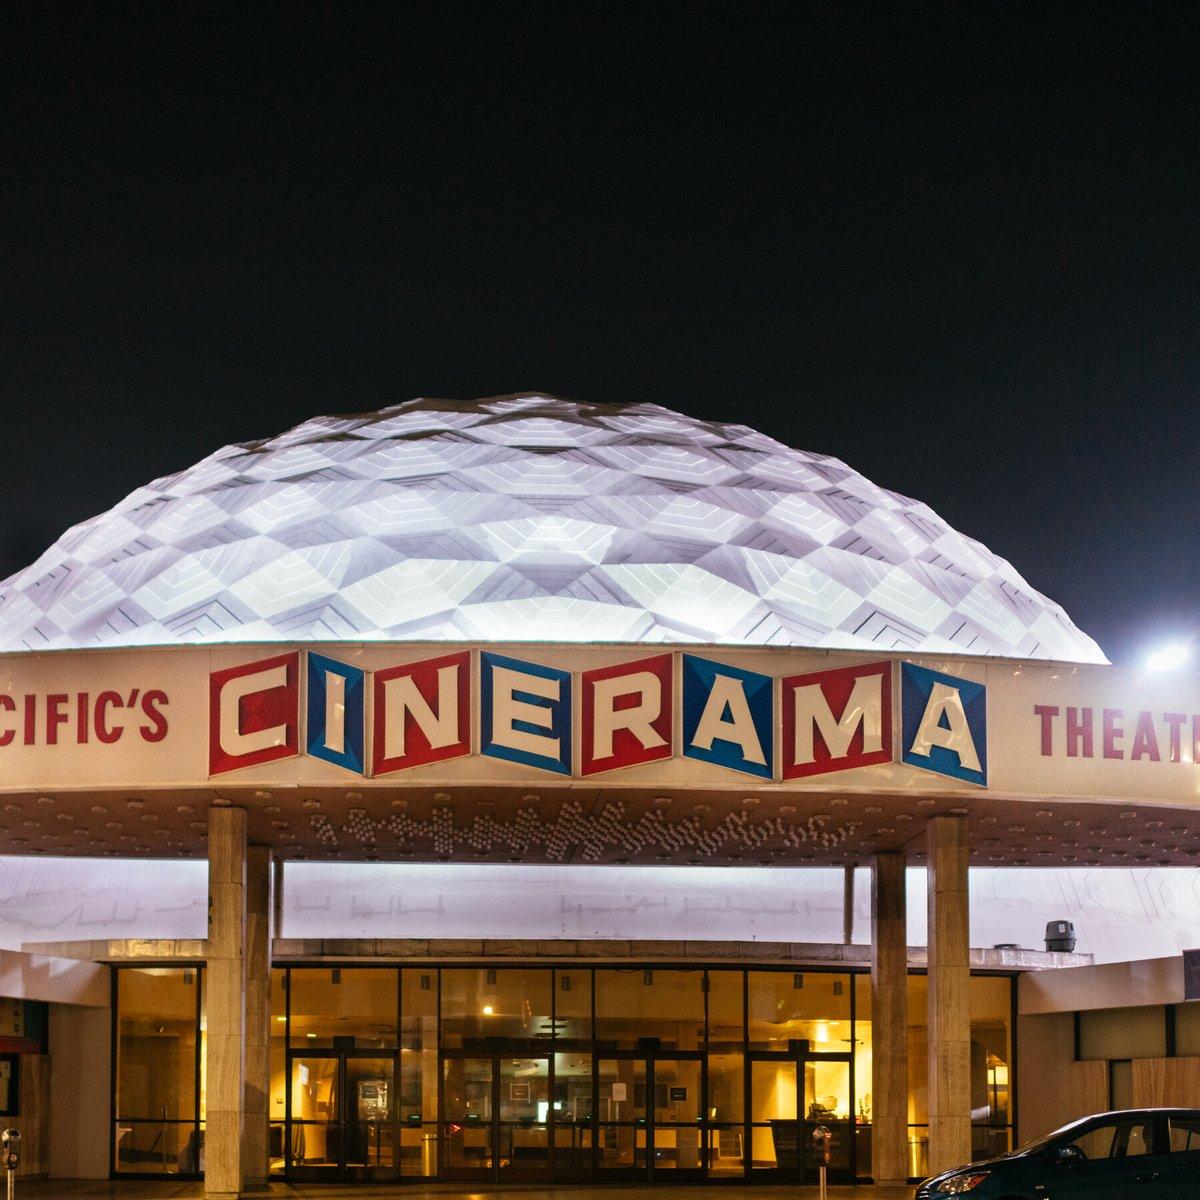 RT @CometGalactic: @Crockett1120 Opening night at the Cinerama dome, pretty incredible https://t.co/AlutDPcUWi